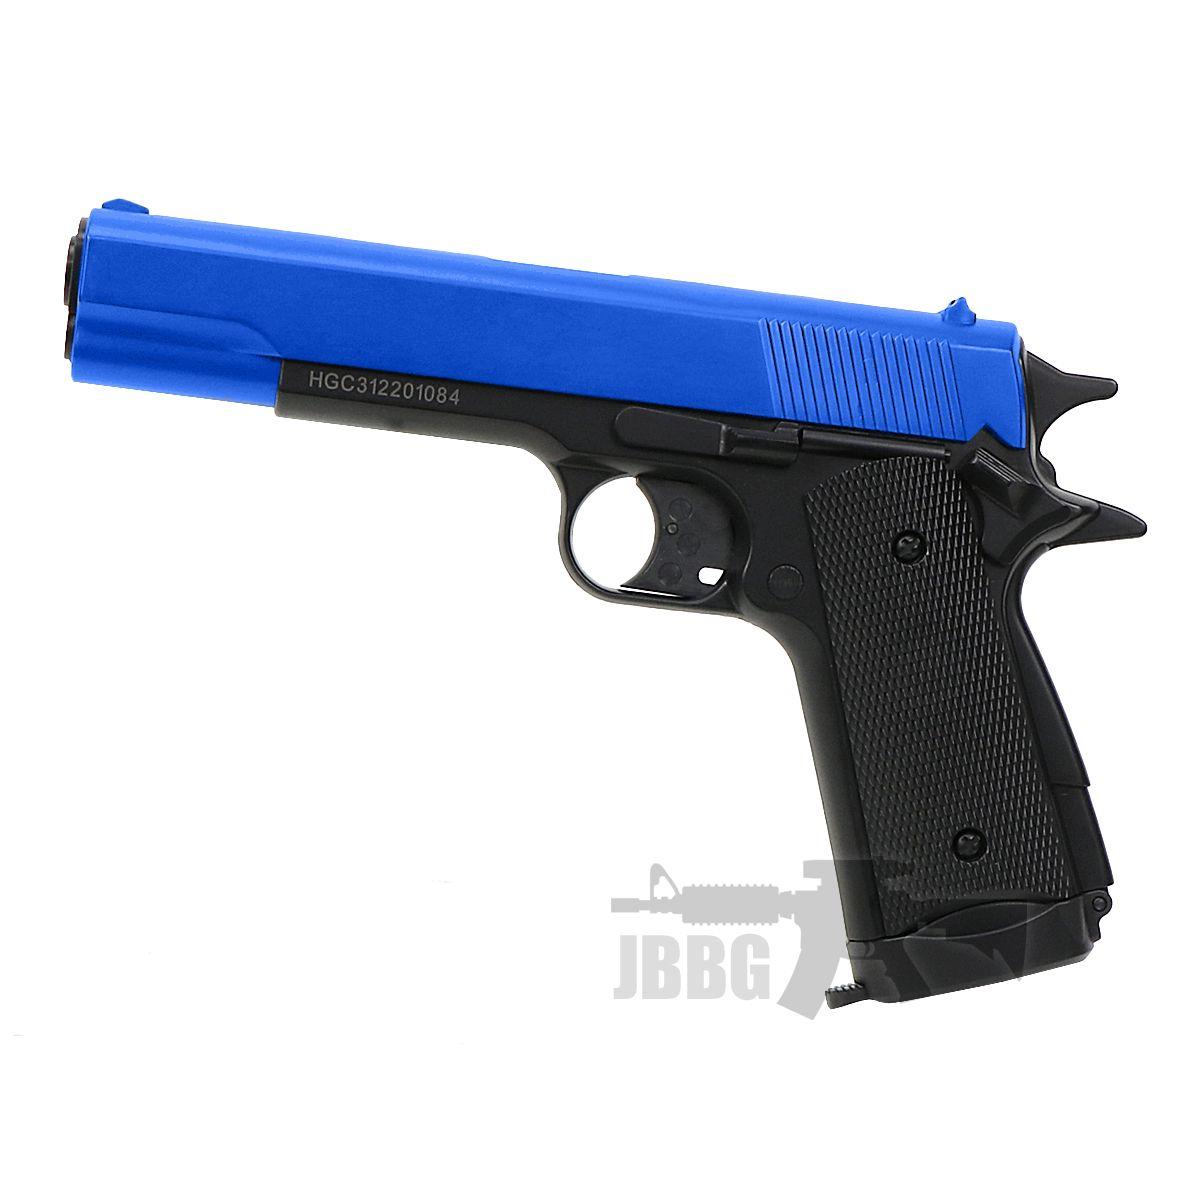 hgc312-pistol-1-blue